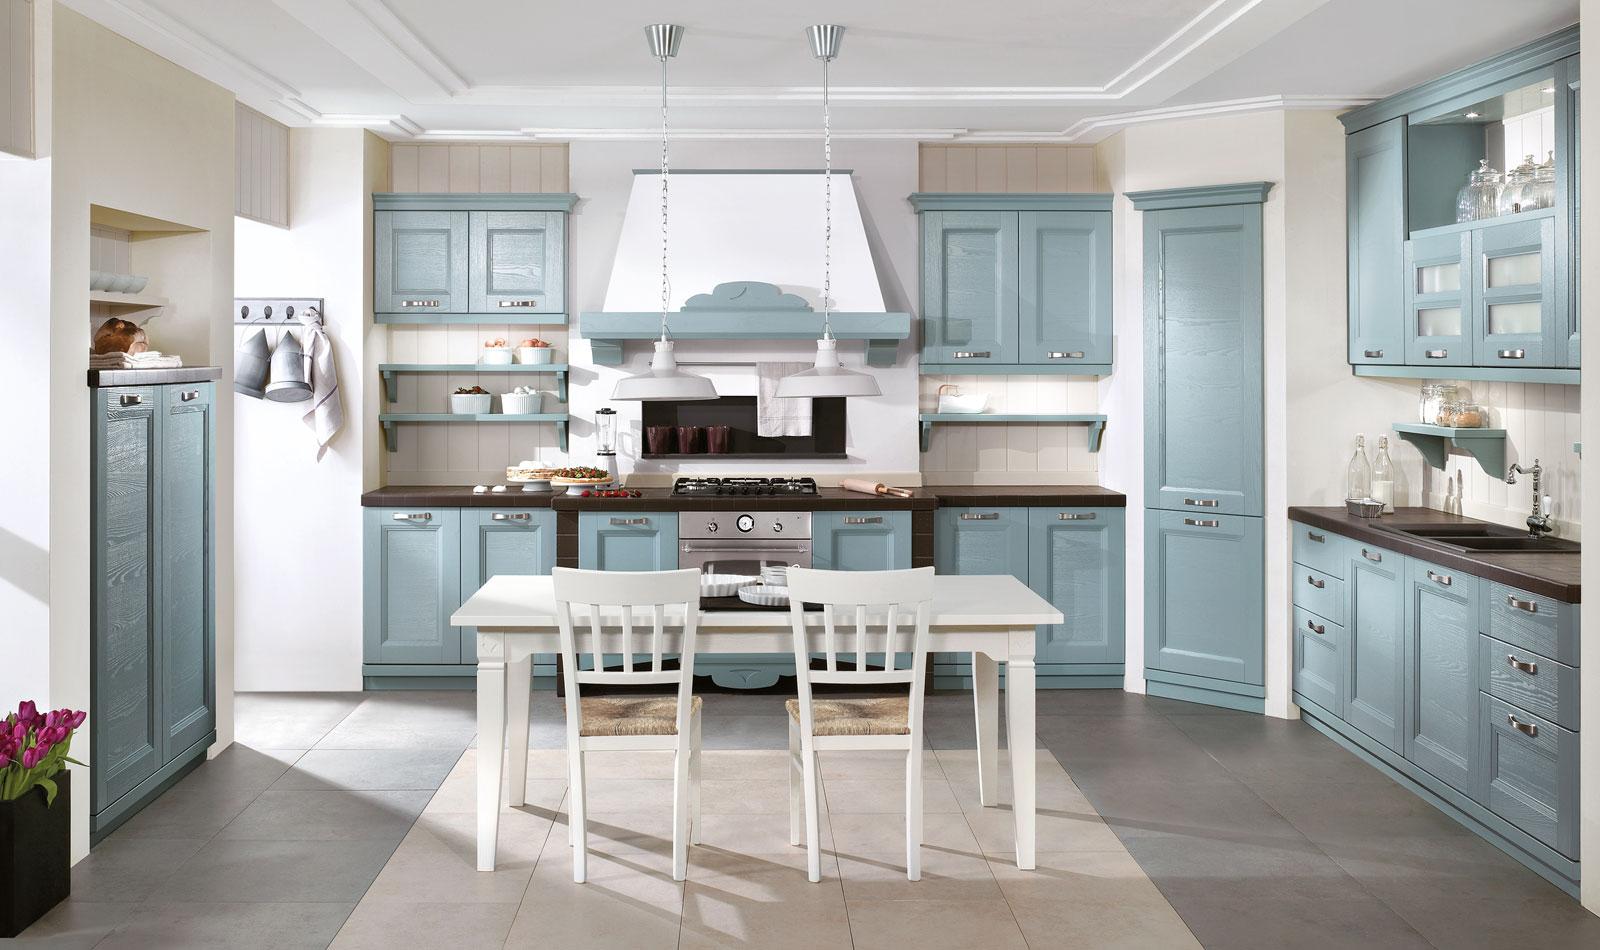 Paraschizzi cucina country stunning paraschizzi cucina for Ikea cucina bianca